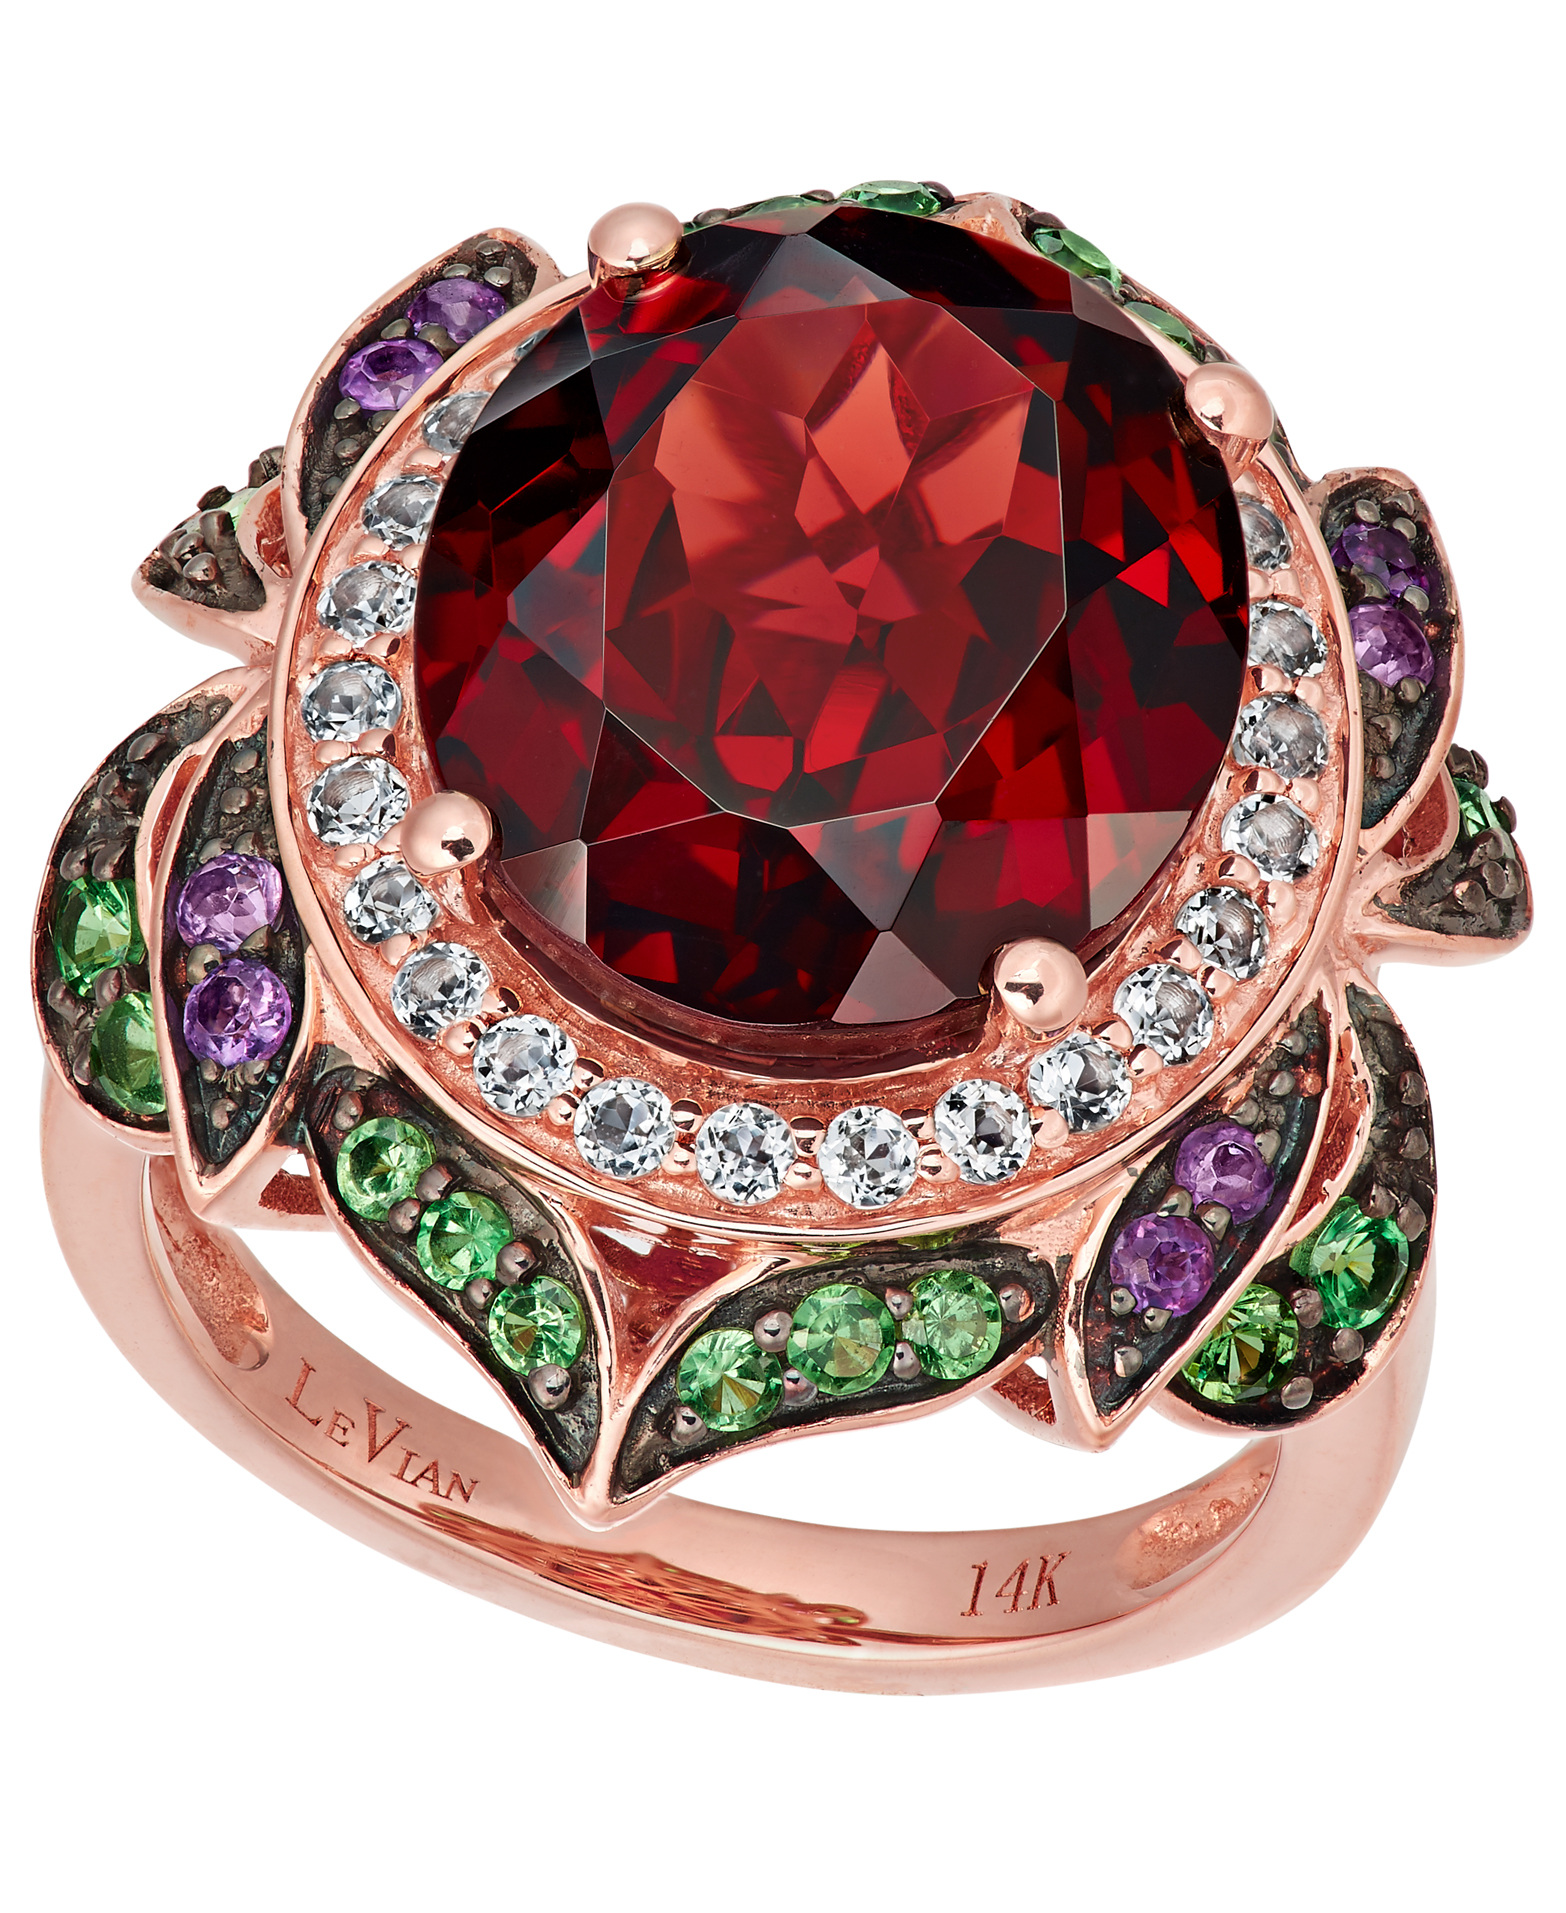 levian_ringimages_jewelry.jpg